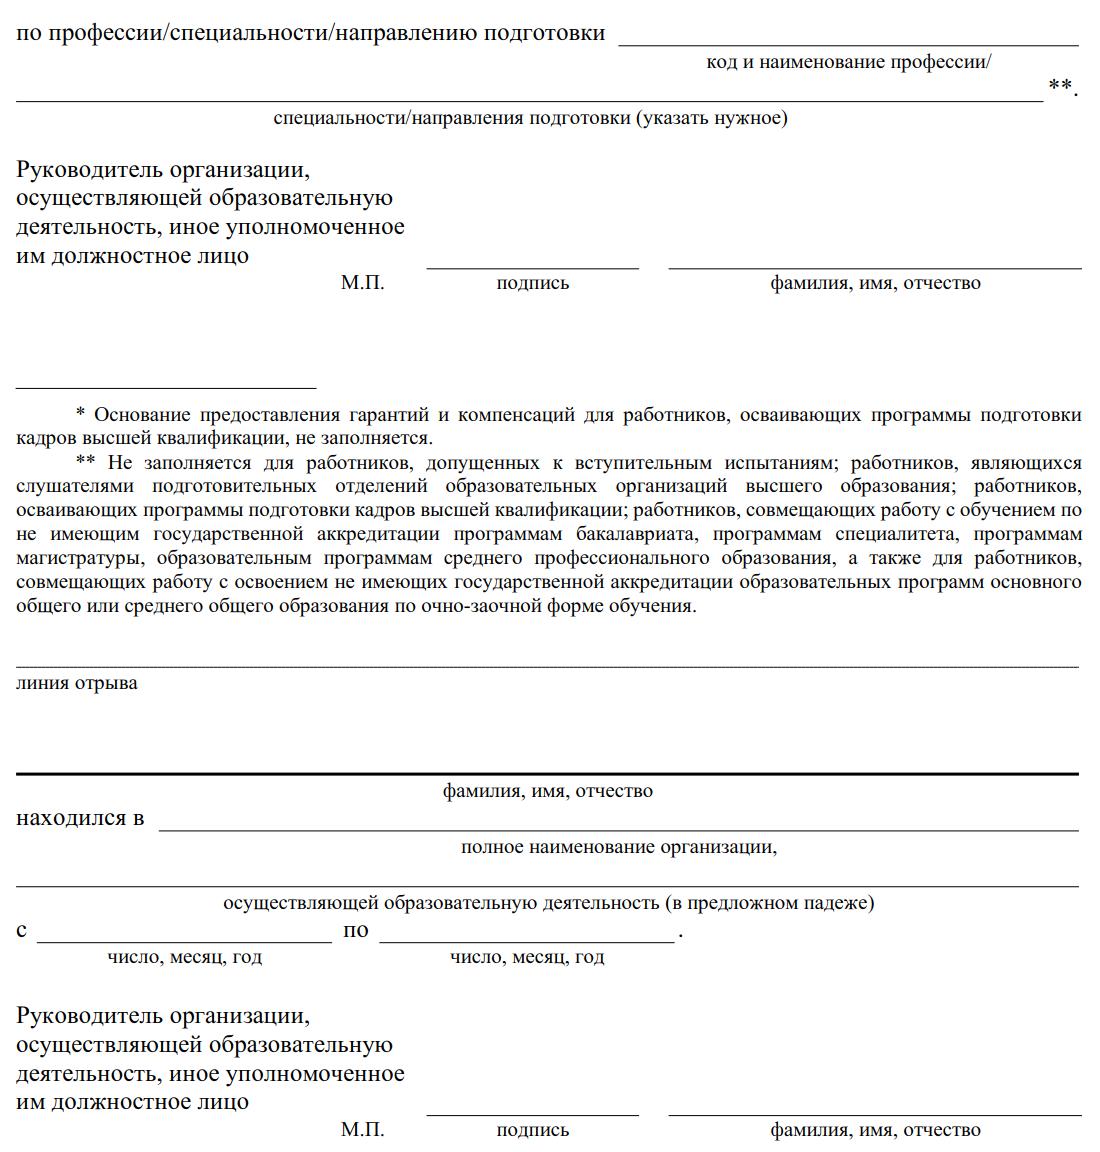 spravka-vyzov-s-2.png